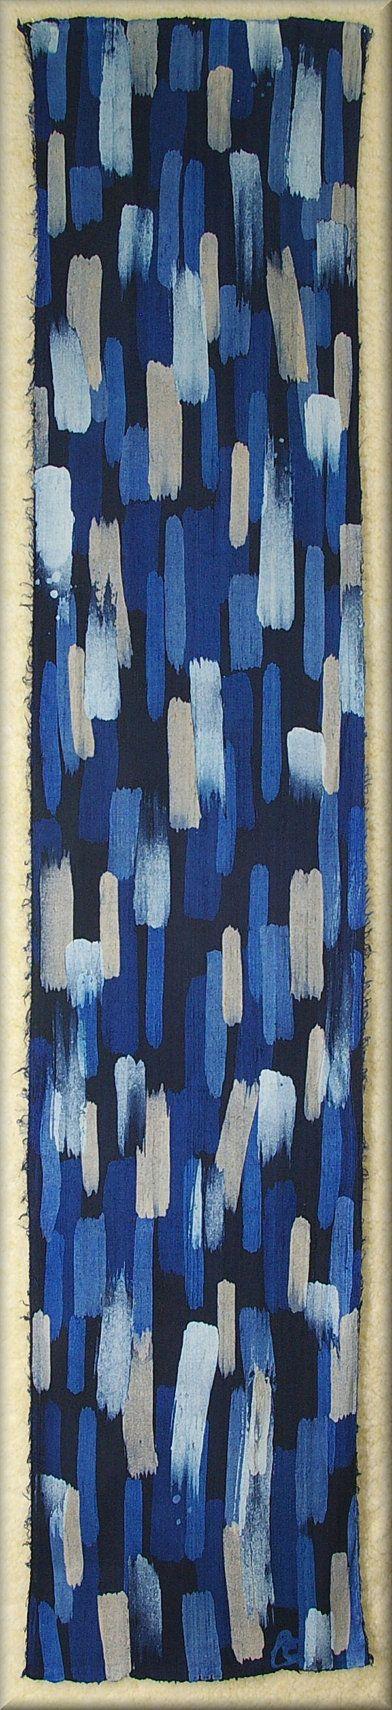 "Brush Strokes Bright Blues and Mushroom Dupioni Mens Silk Scarf (approx. 11x54)  by Laura Elderton ""Silk in Art"""